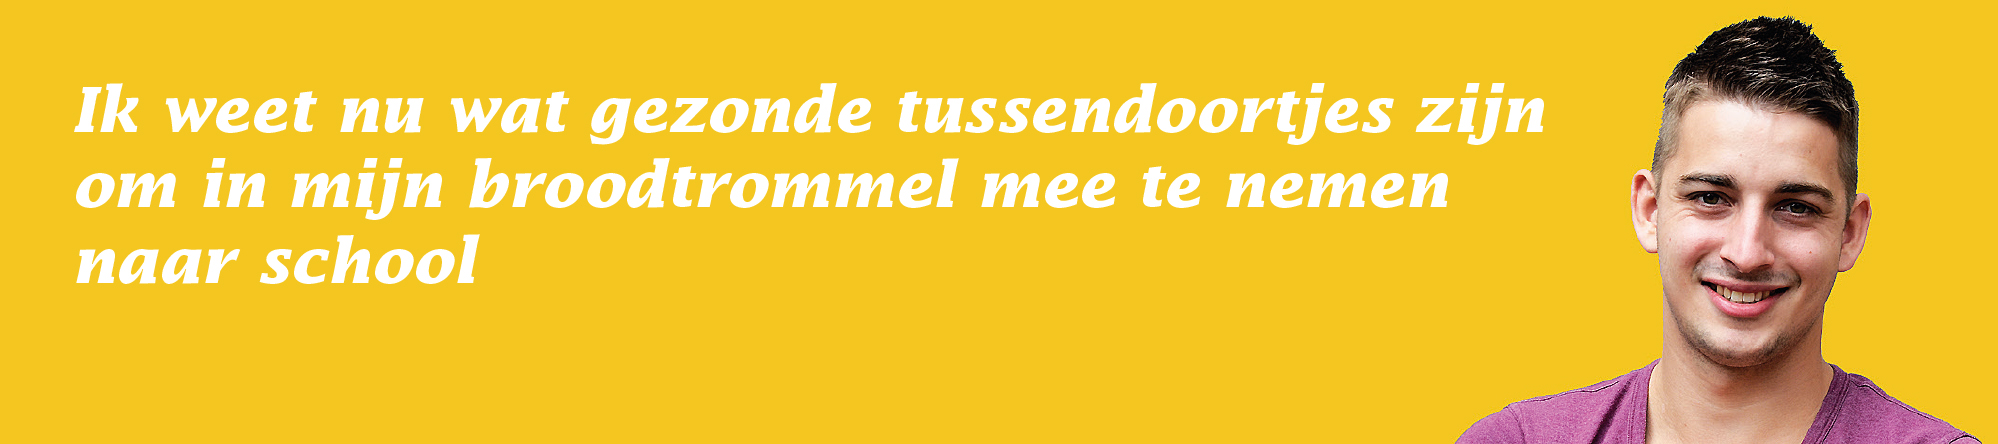 http://de-dietist.nl/wp-content/uploads/2016/09/de-dietist-quote-mathijs.jpg